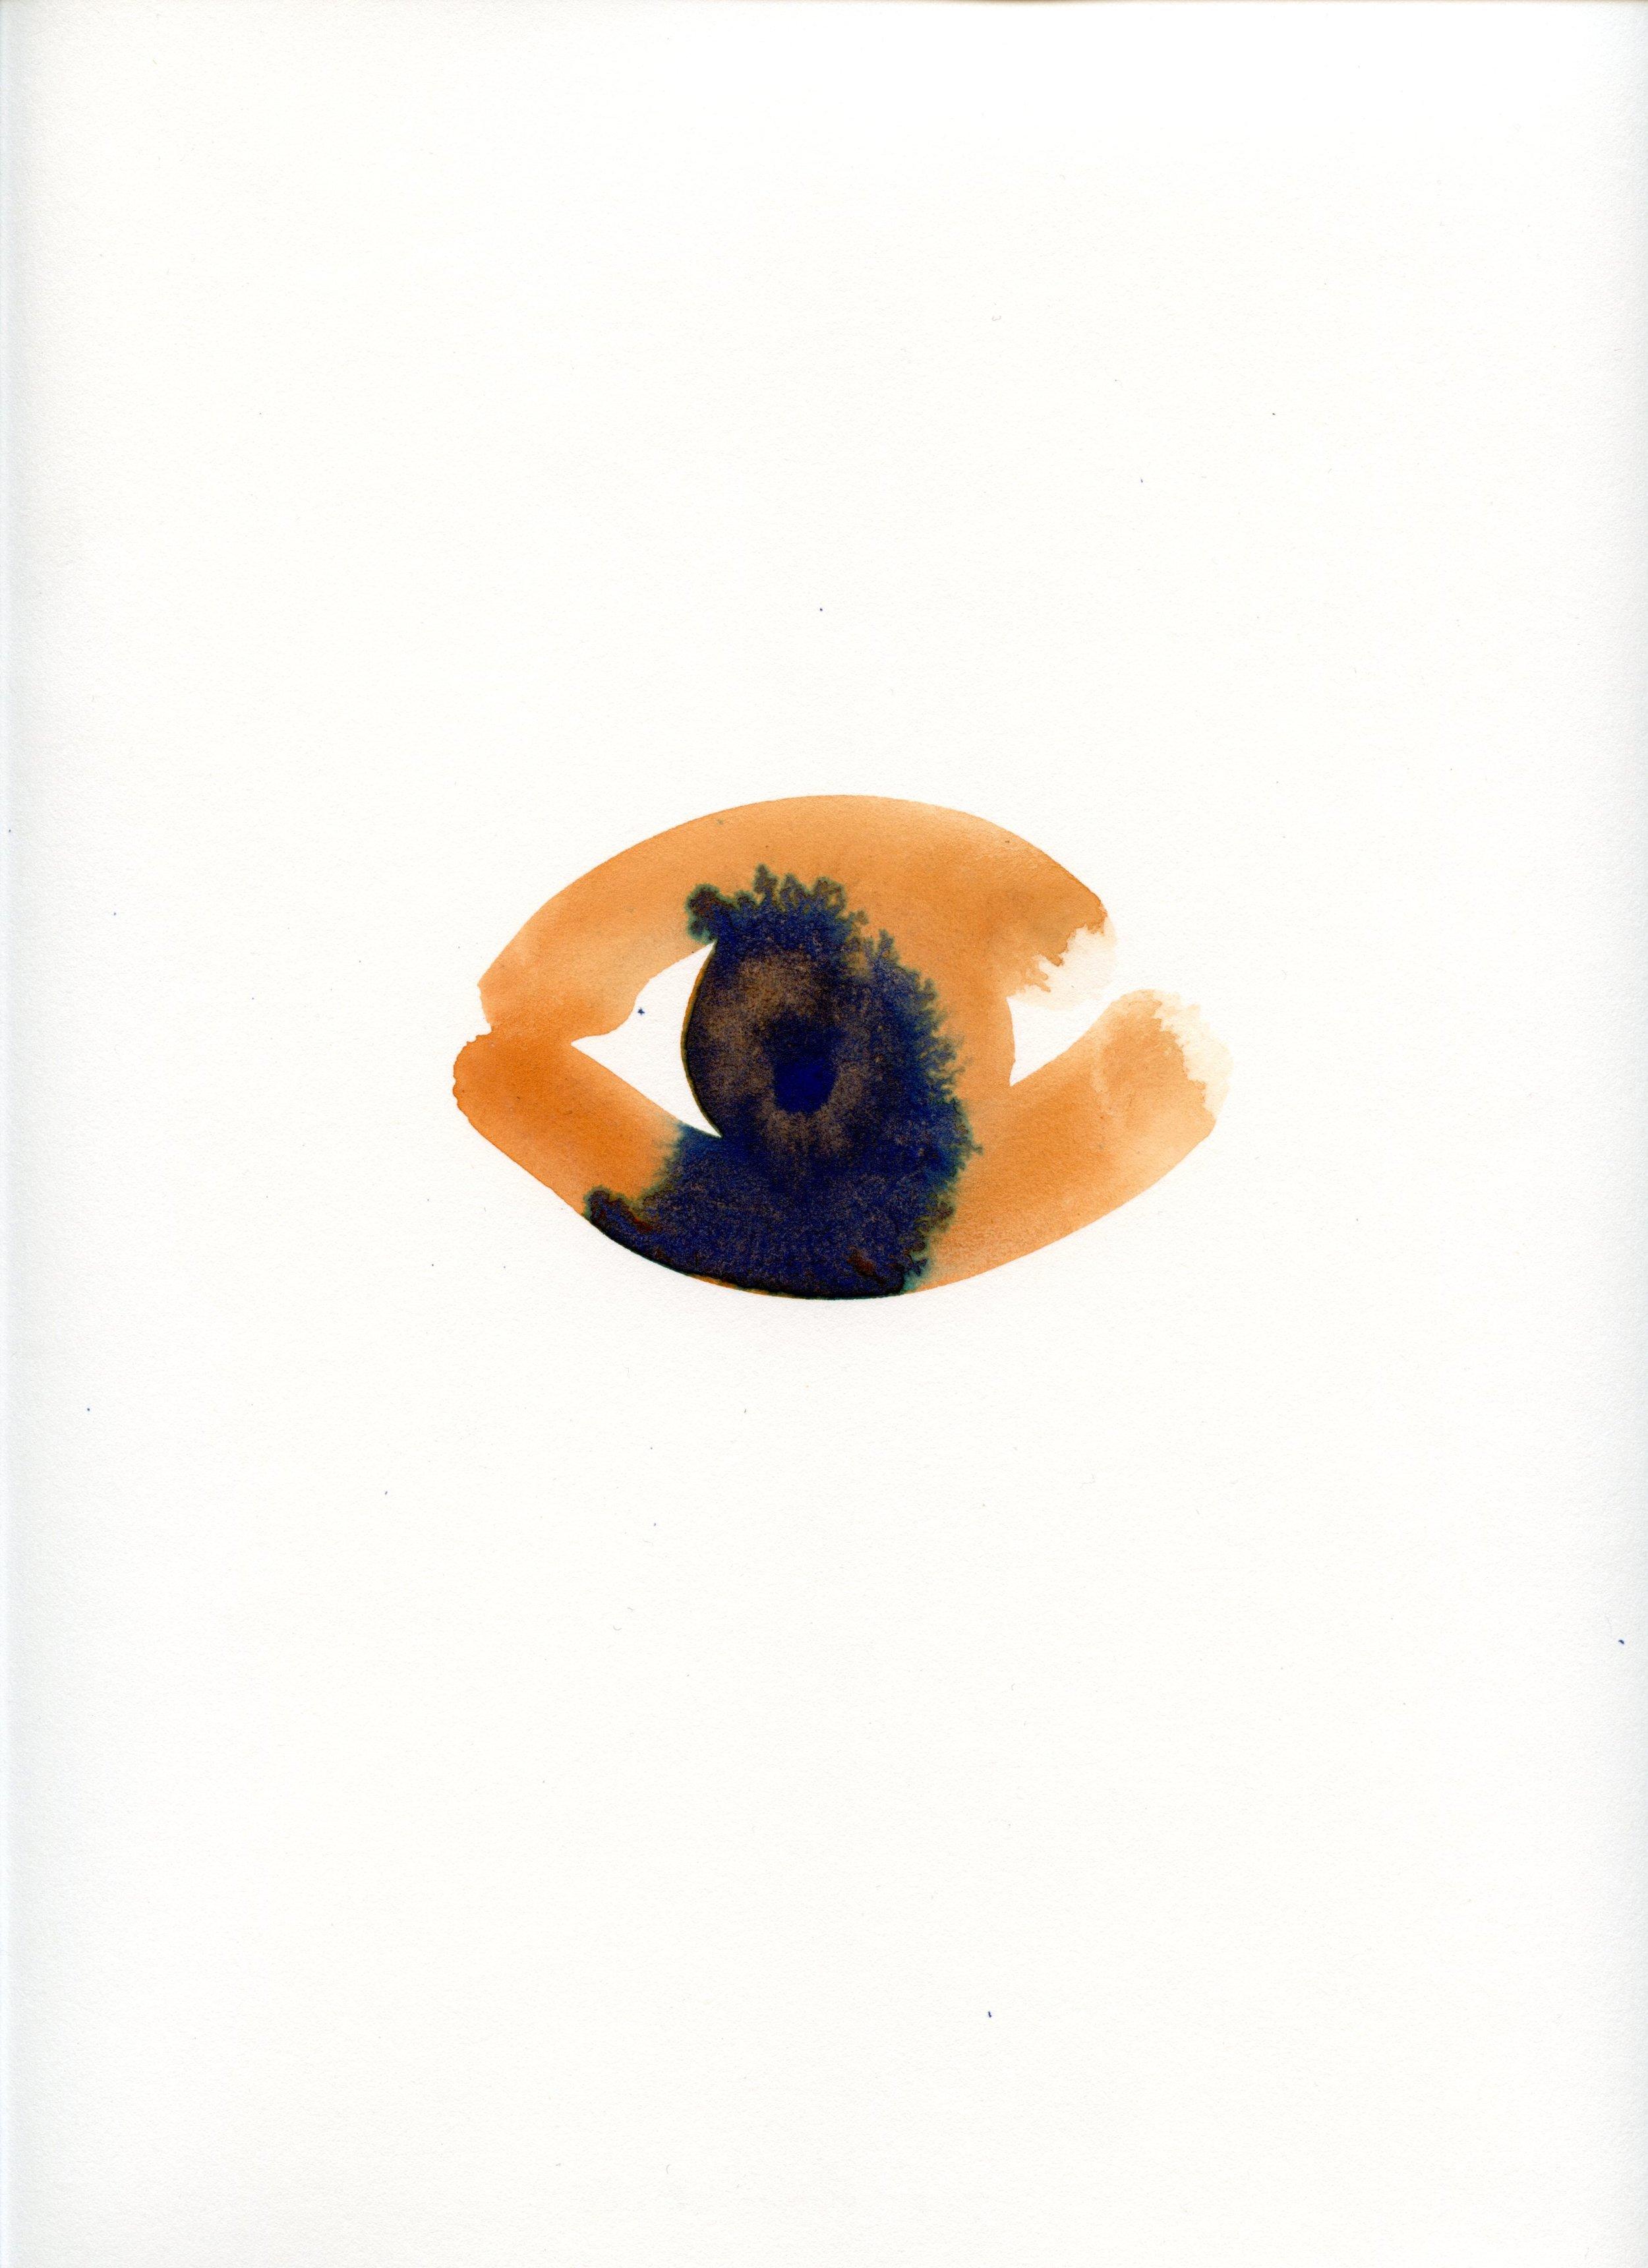 orangeblue002.jpg